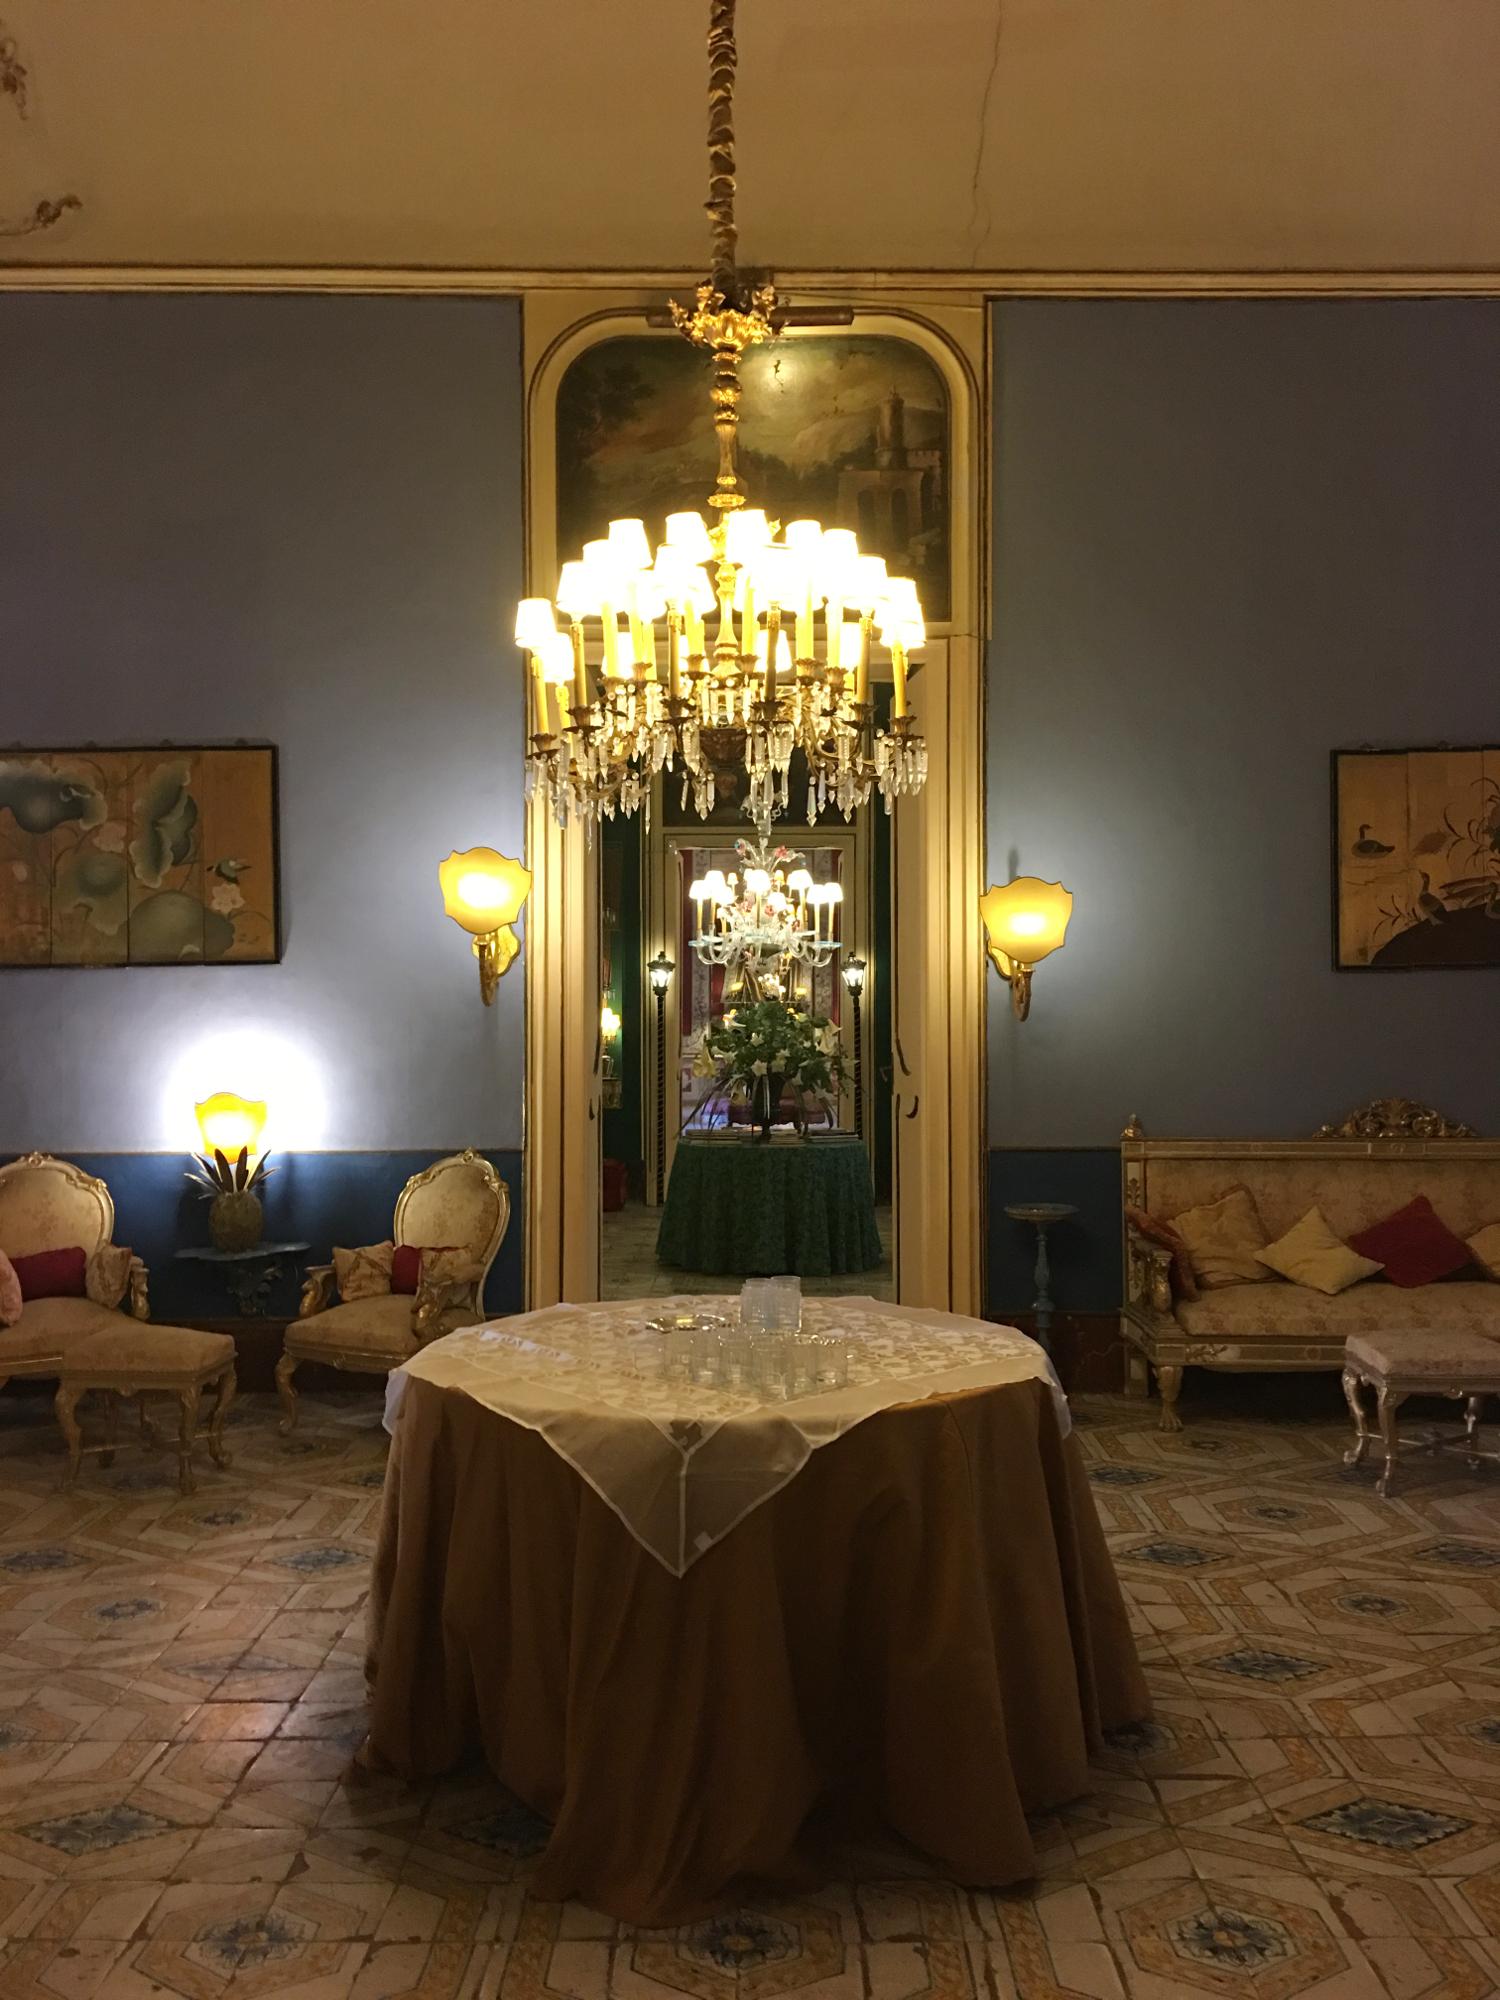 rocaille-blog-palermo-palazzo-ajutamicristo-1